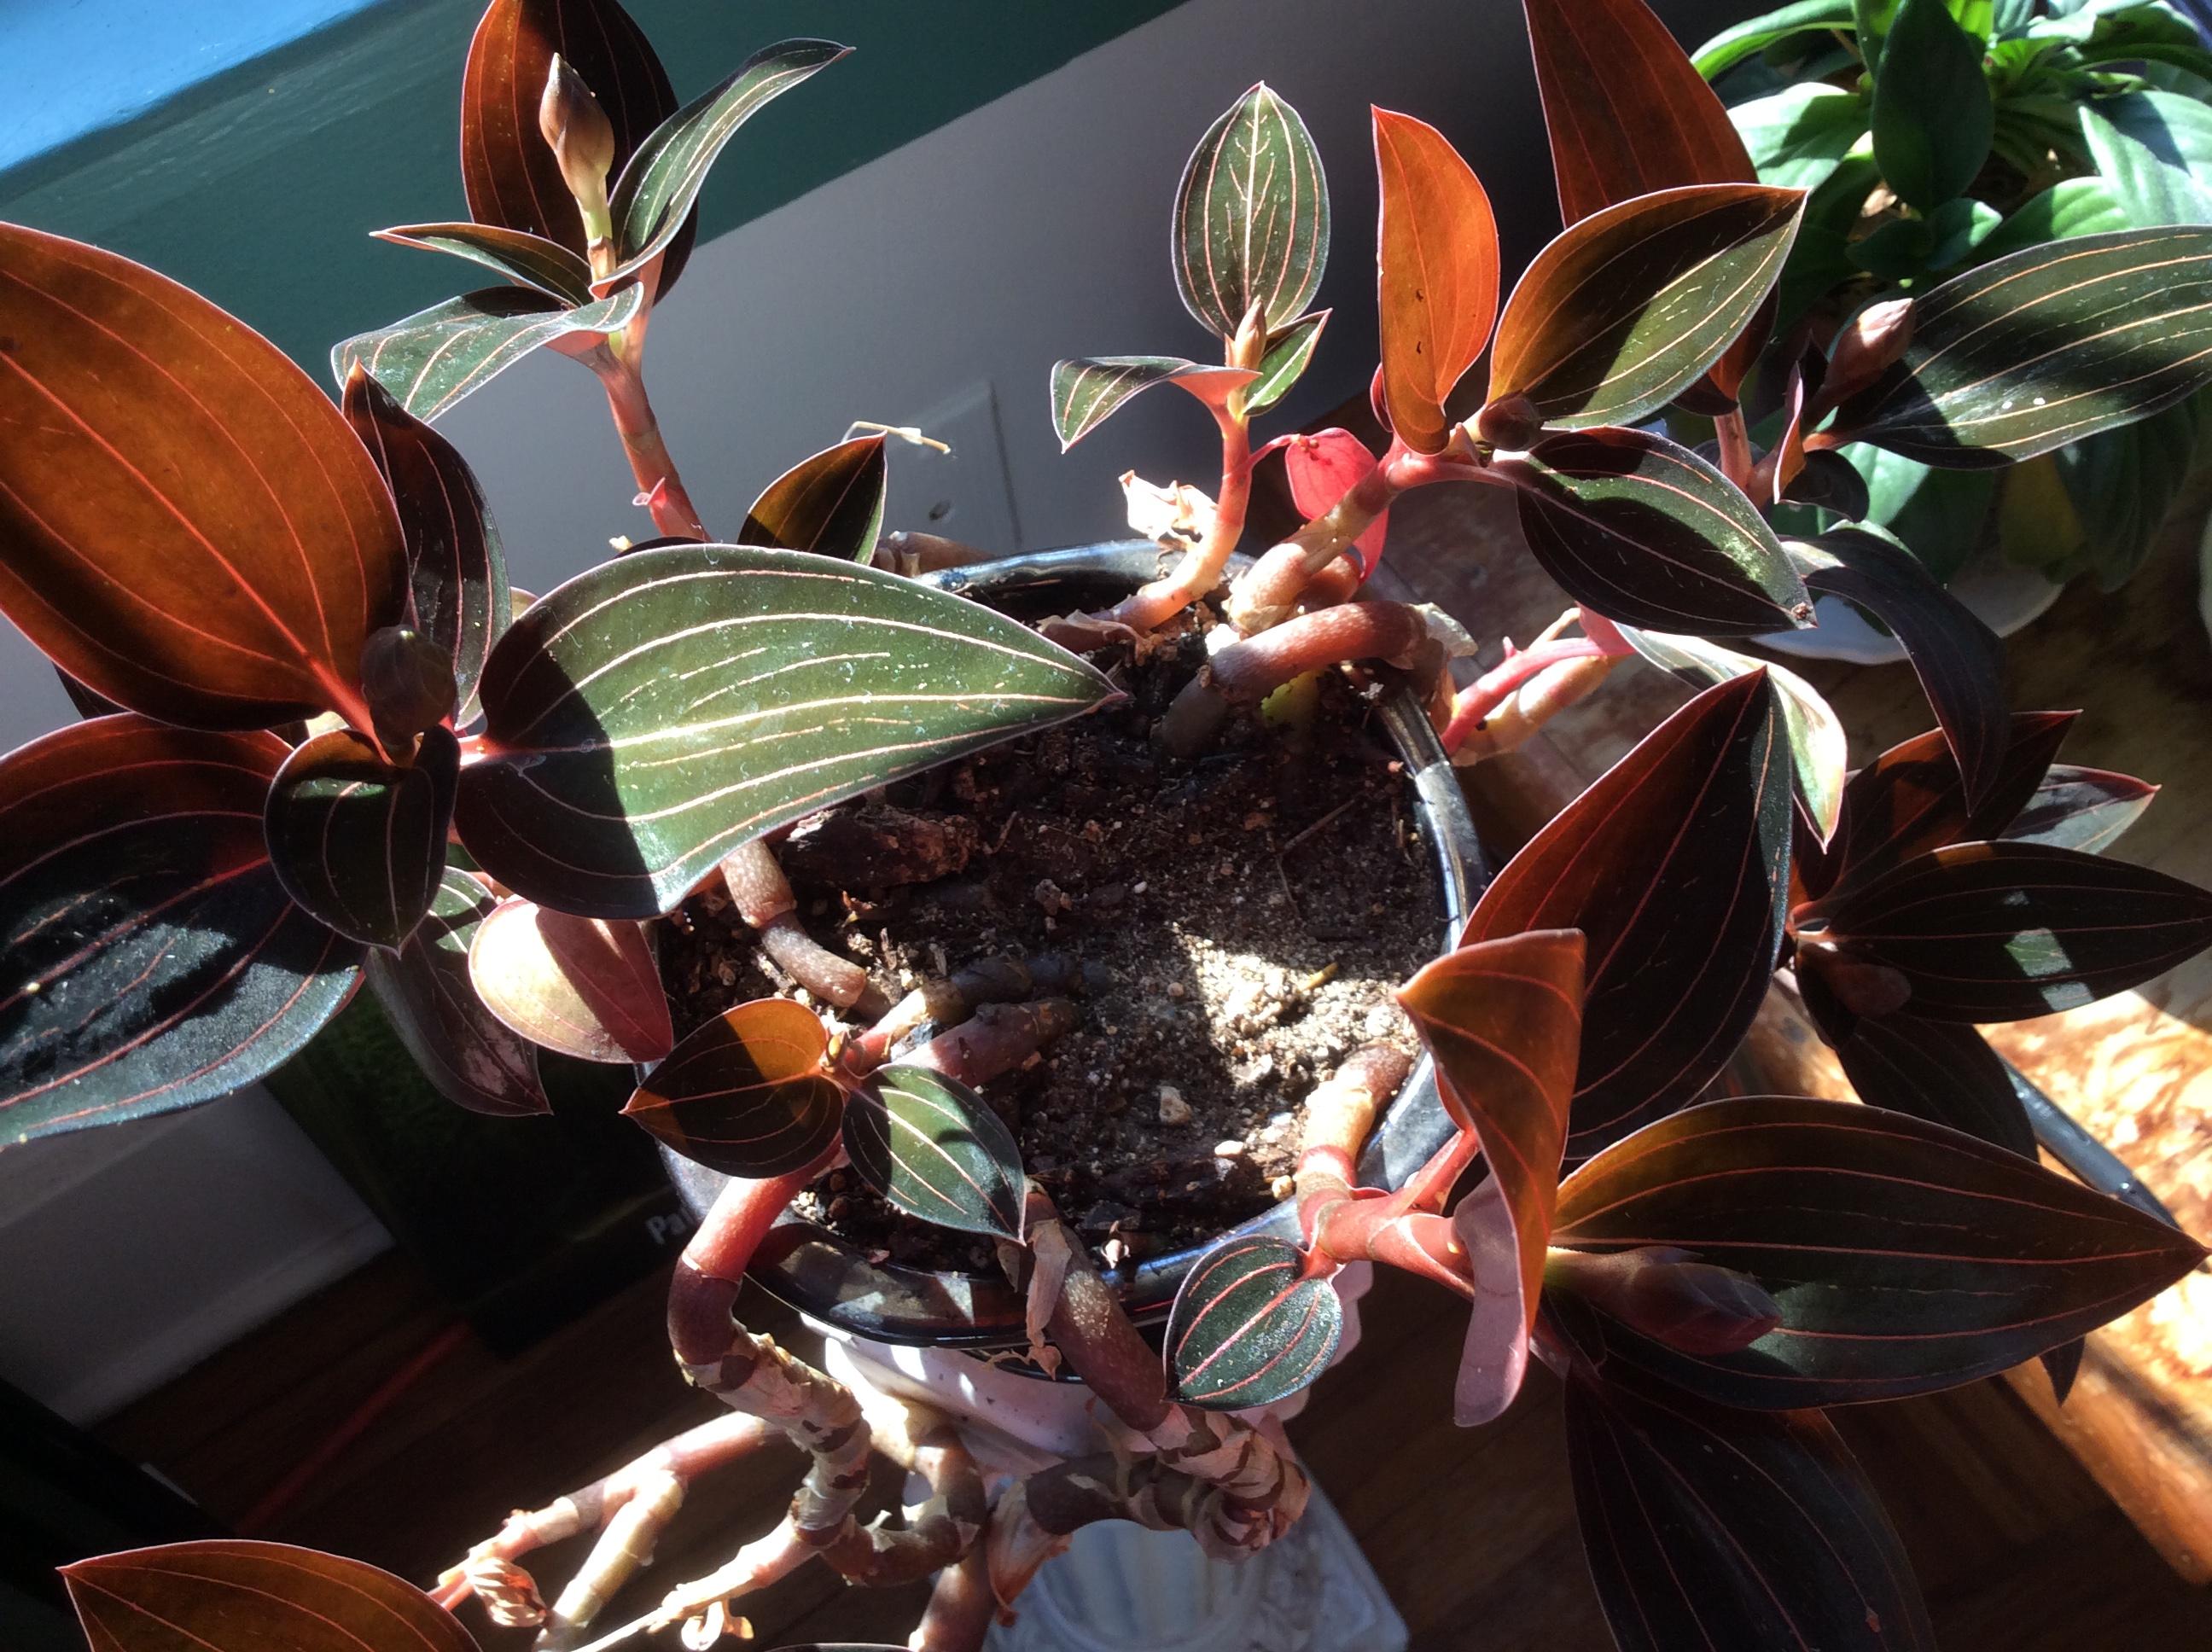 Jewel Orchid Joyous February Bloomer